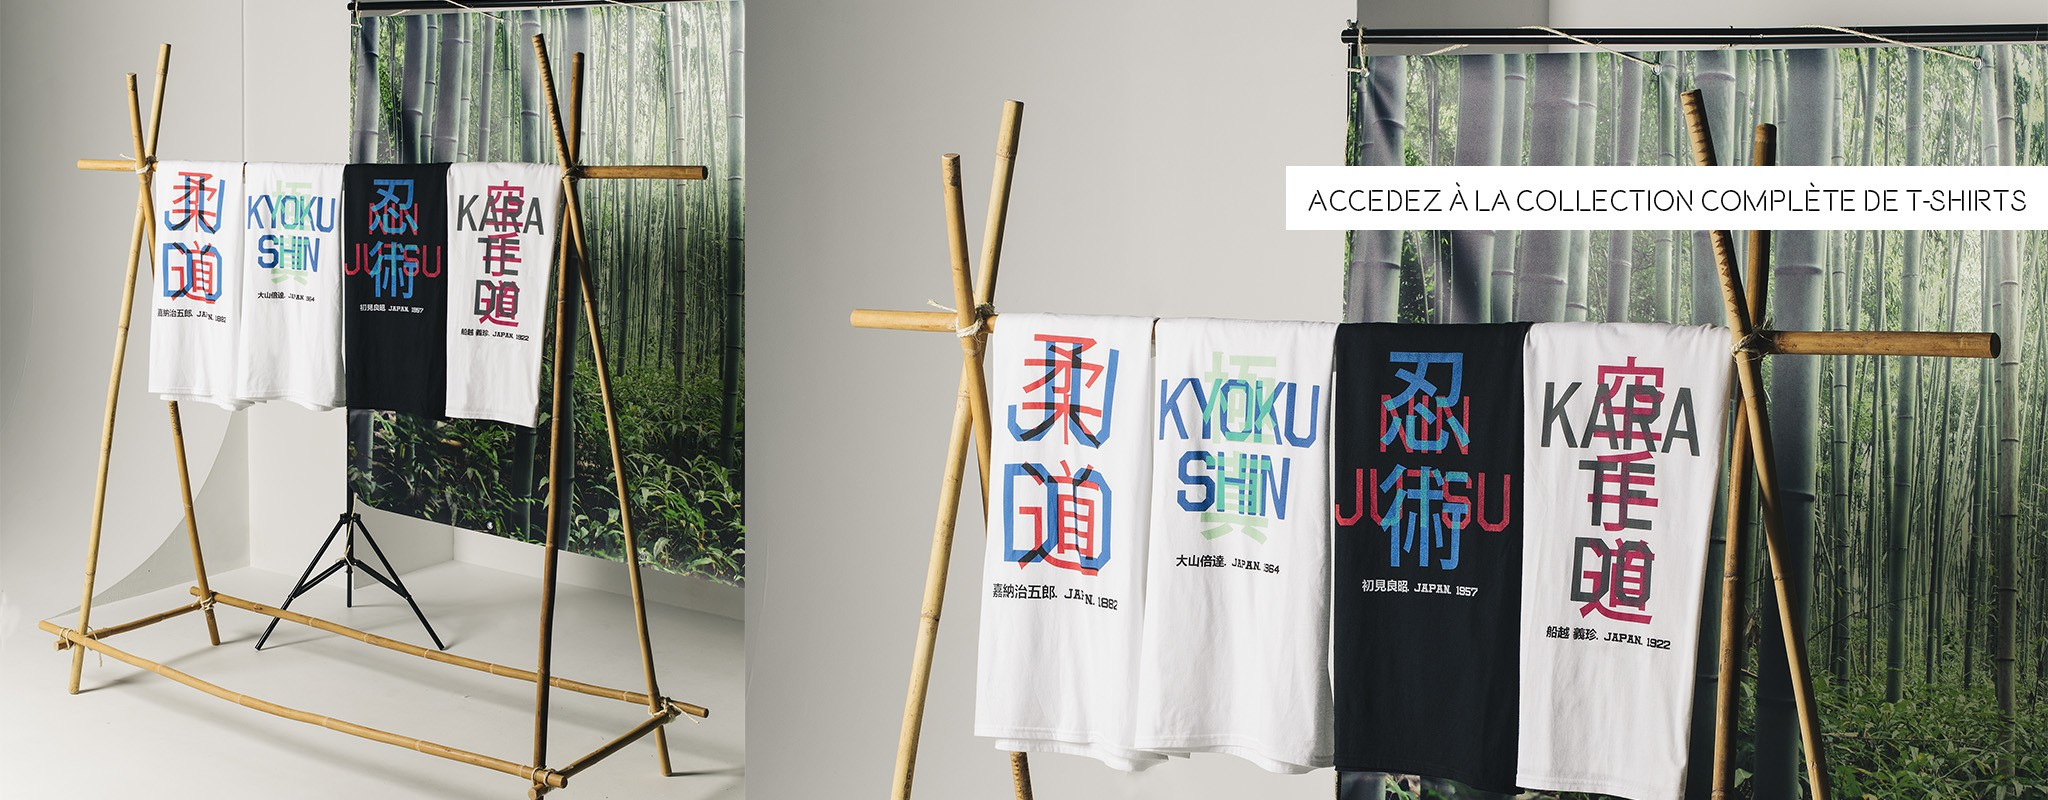 T-shirts Arts Martiaux